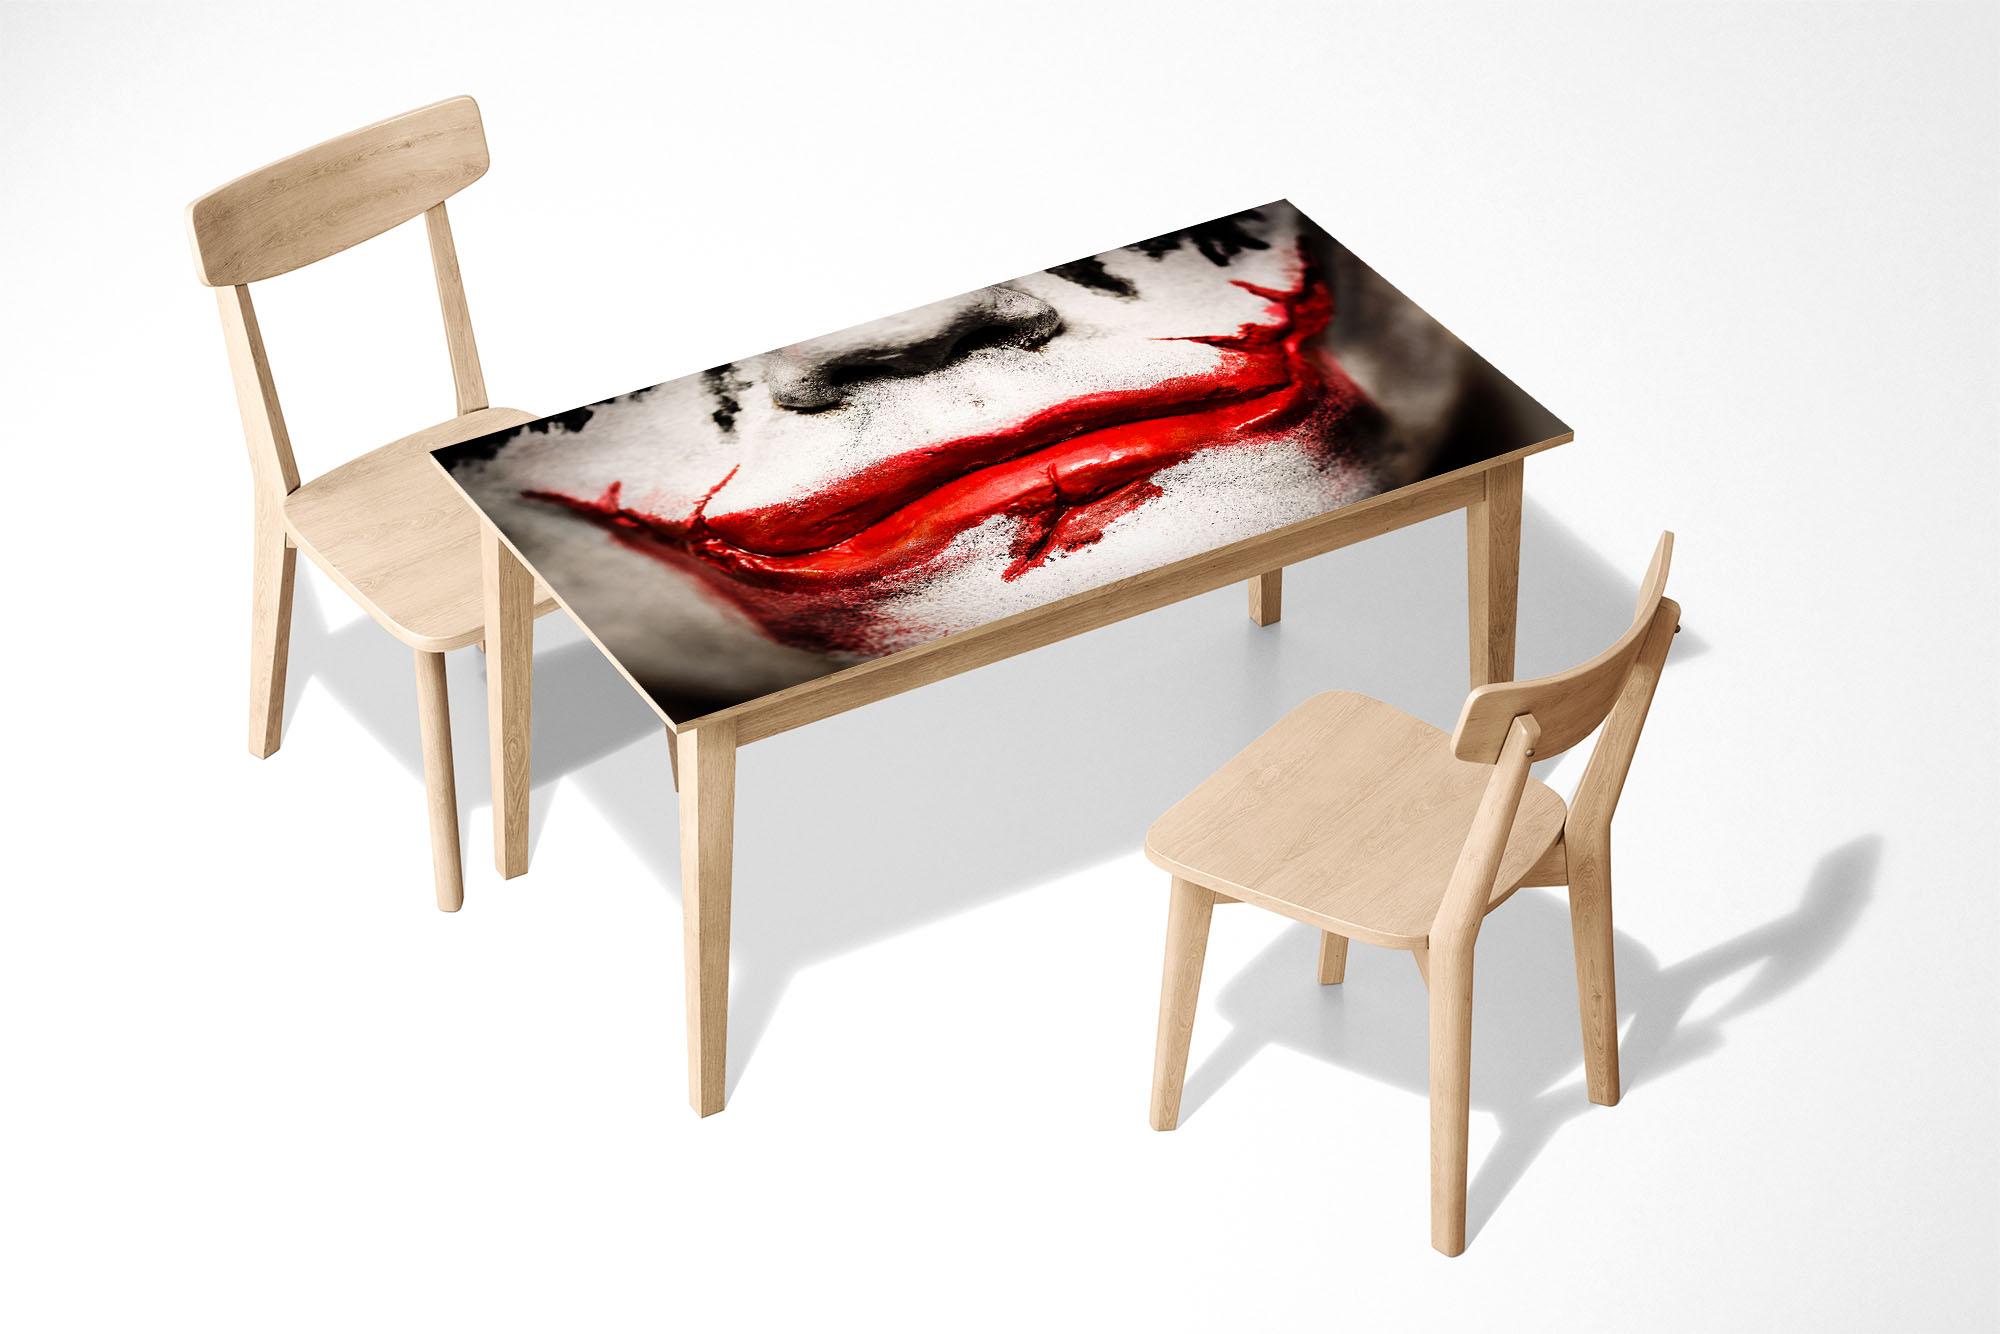 Joker Smile Face Laminated Self Adhesive Vinyl Table Desk Art Décor Cover